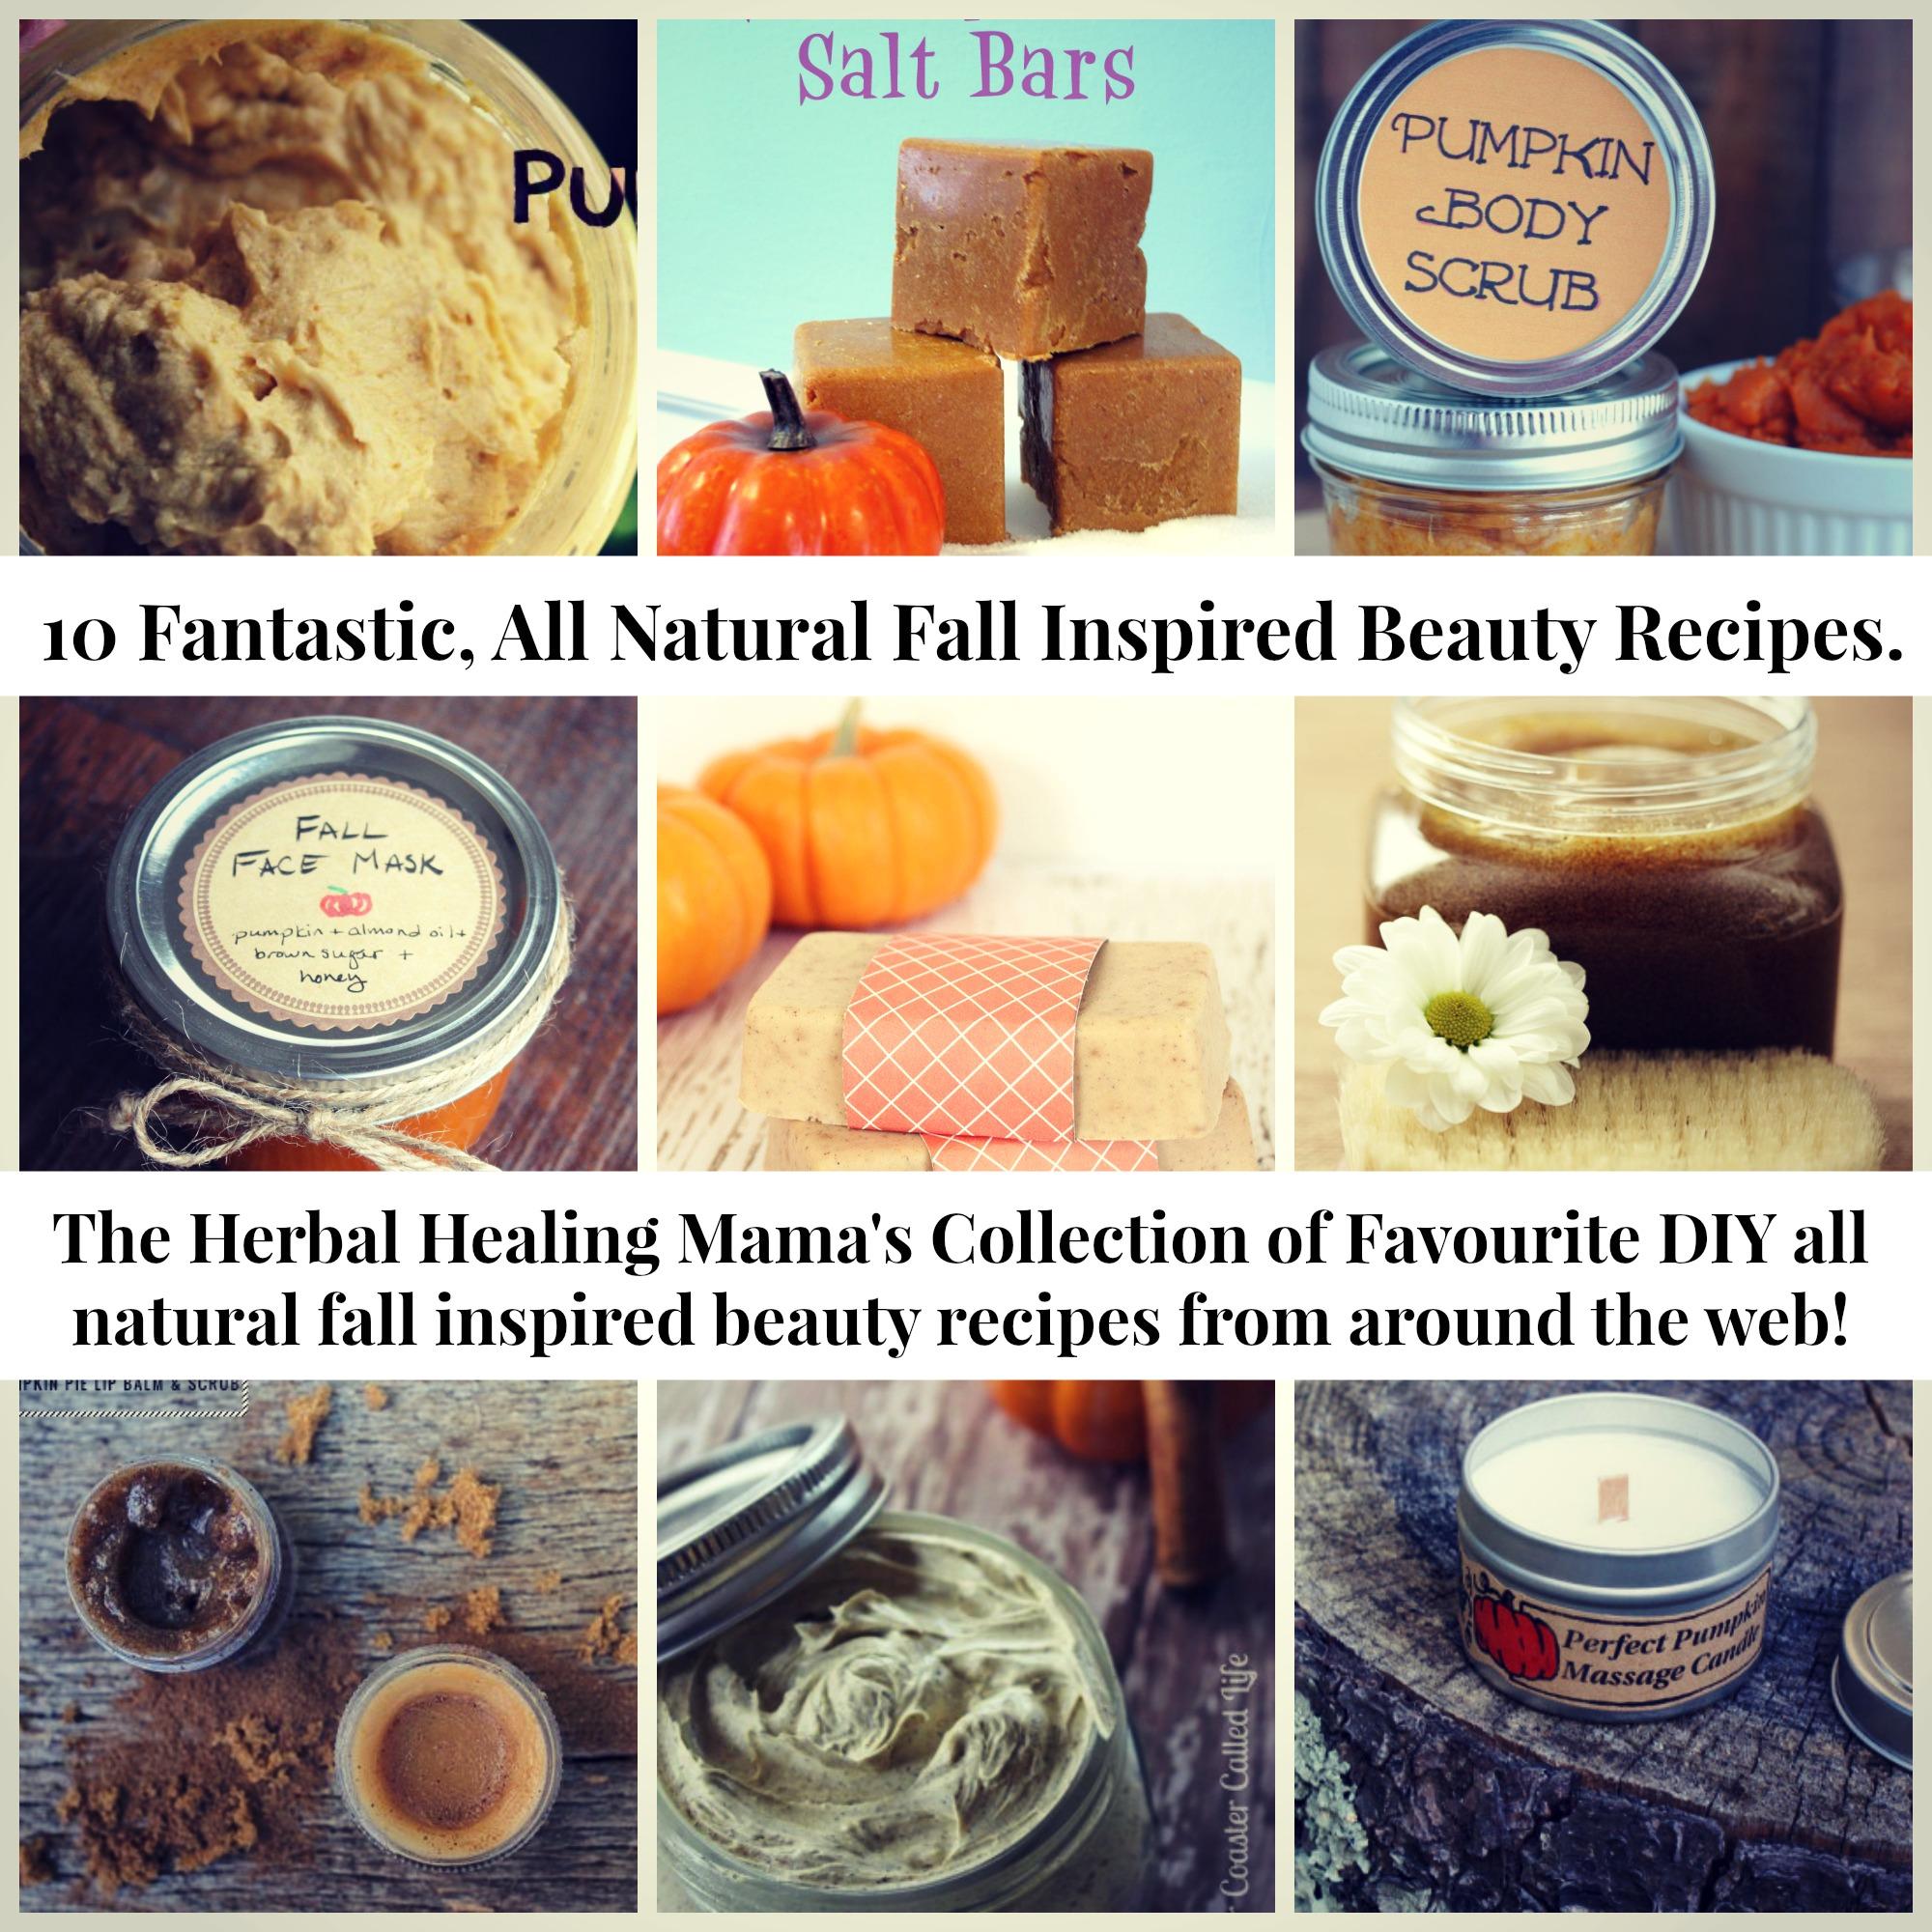 10 Fantastic All Natural Fall Inspired Beauty Recipes The Herbal Healing Mama